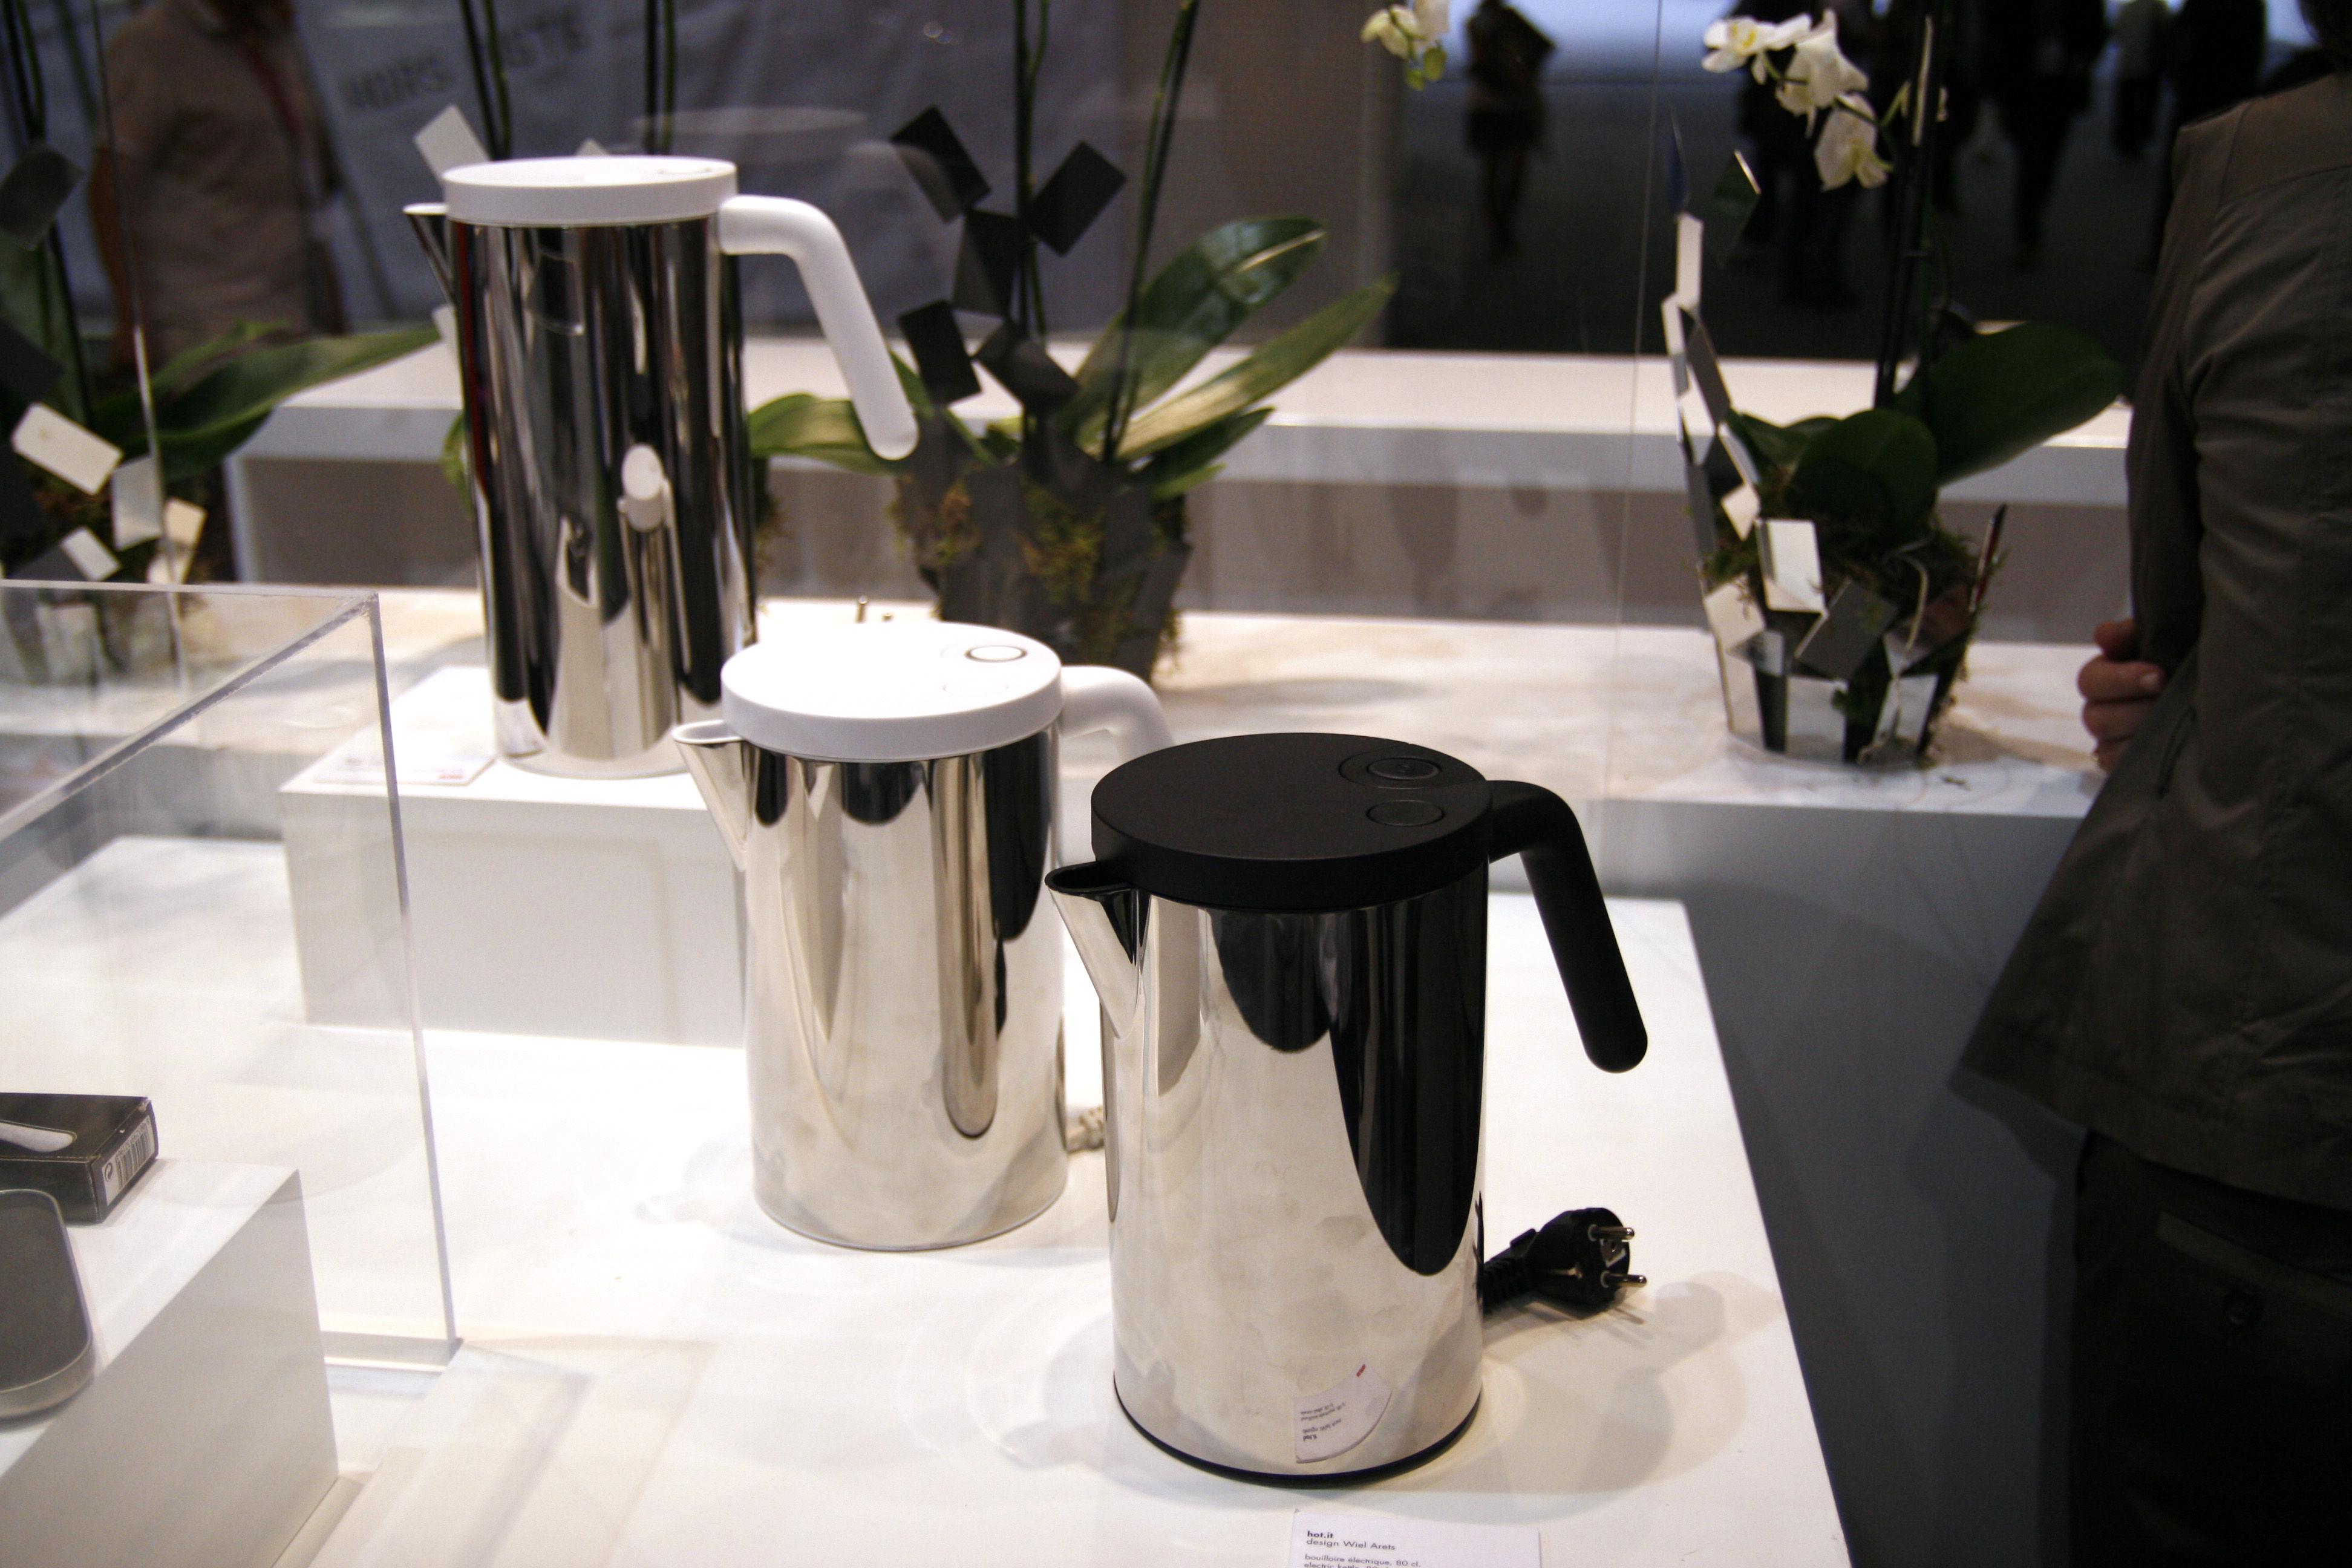 140 cl alessi wasserkocher. Black Bedroom Furniture Sets. Home Design Ideas